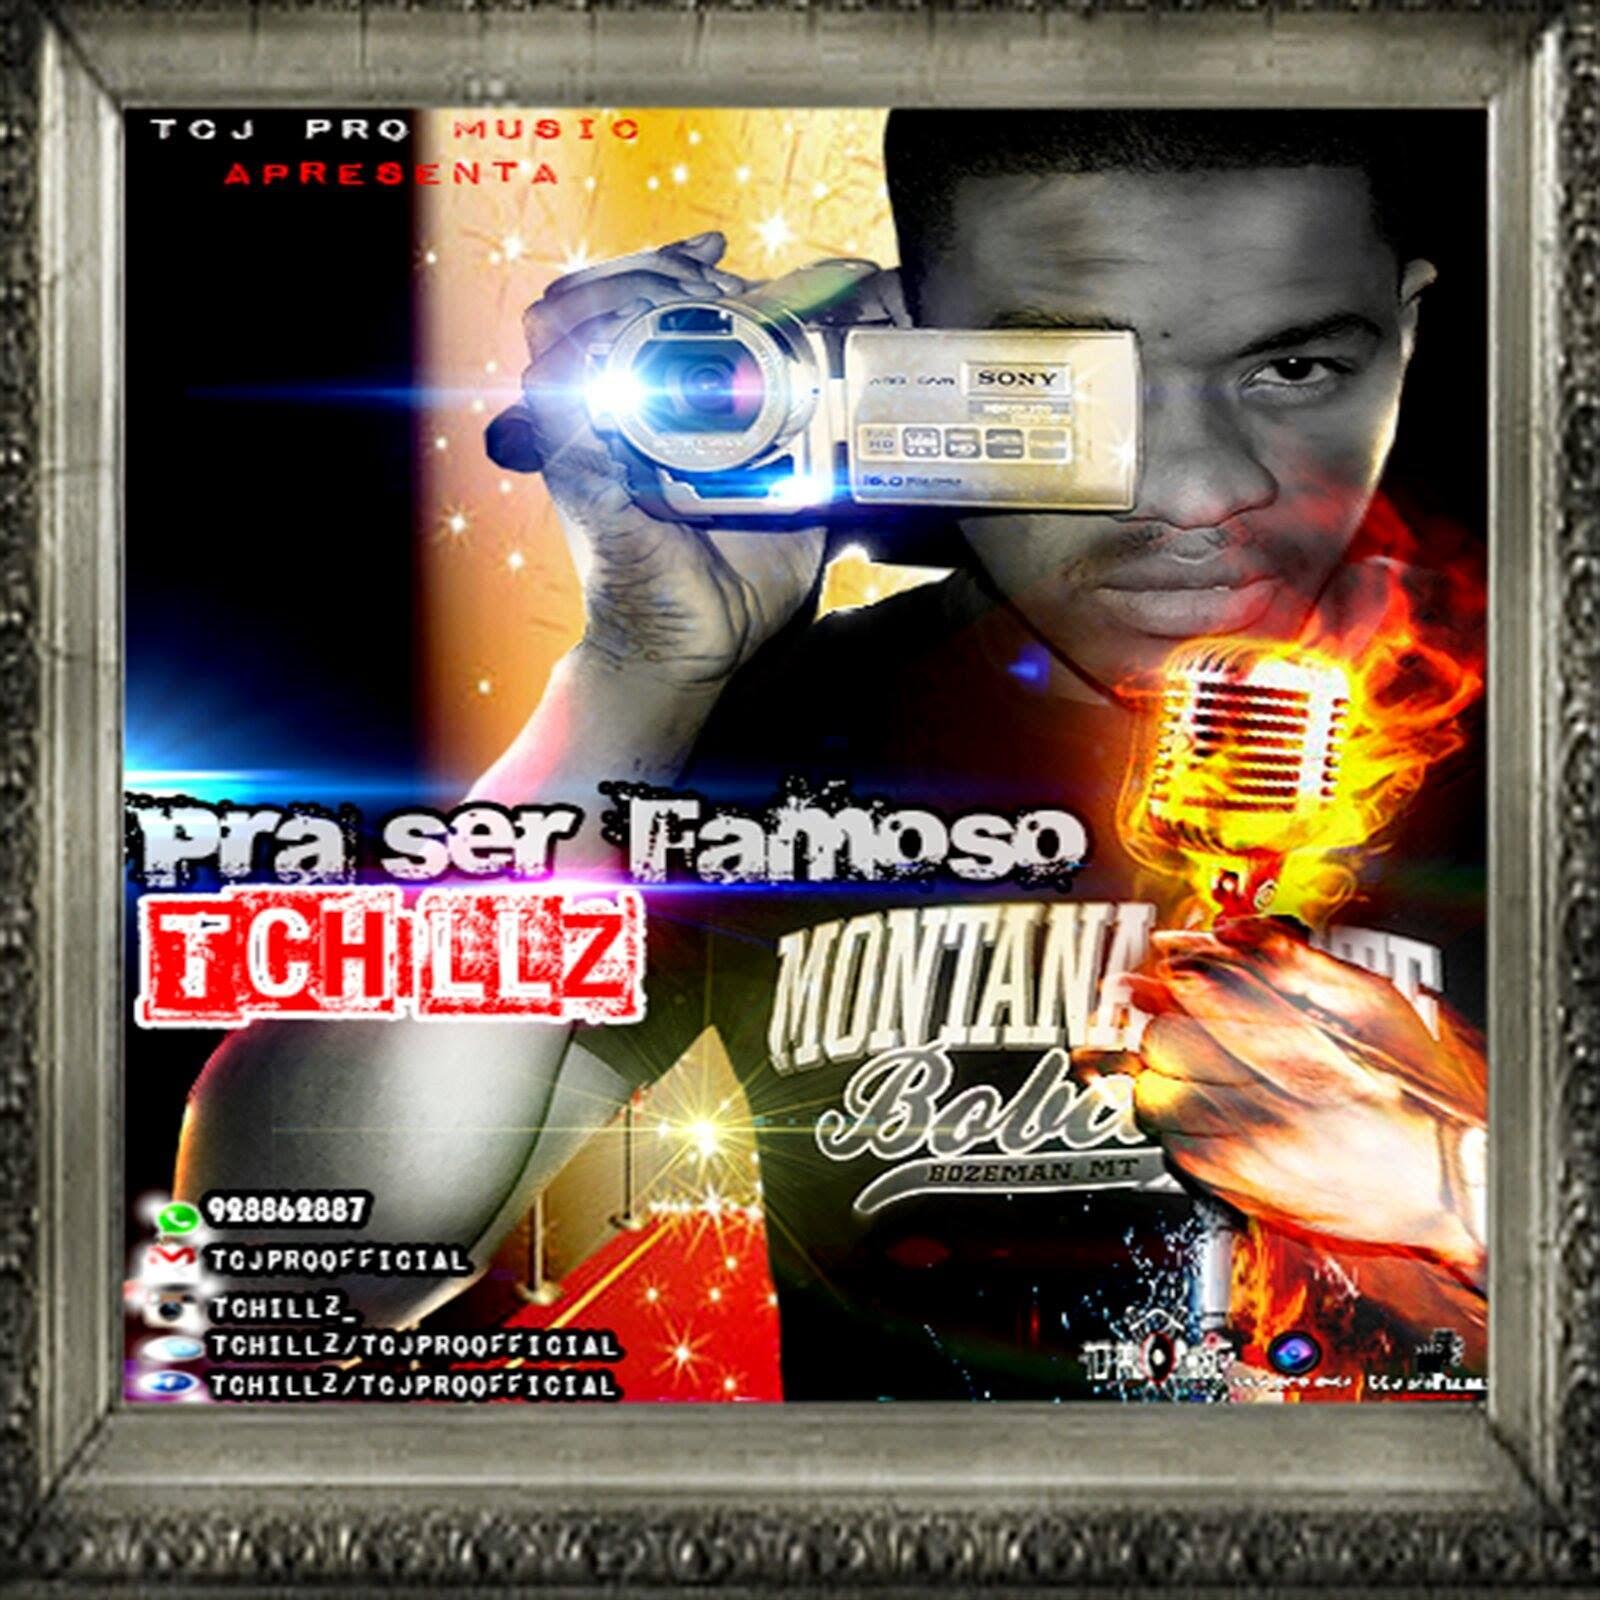 BAIXA : Tchillz - Pra ser Famoso(Download)